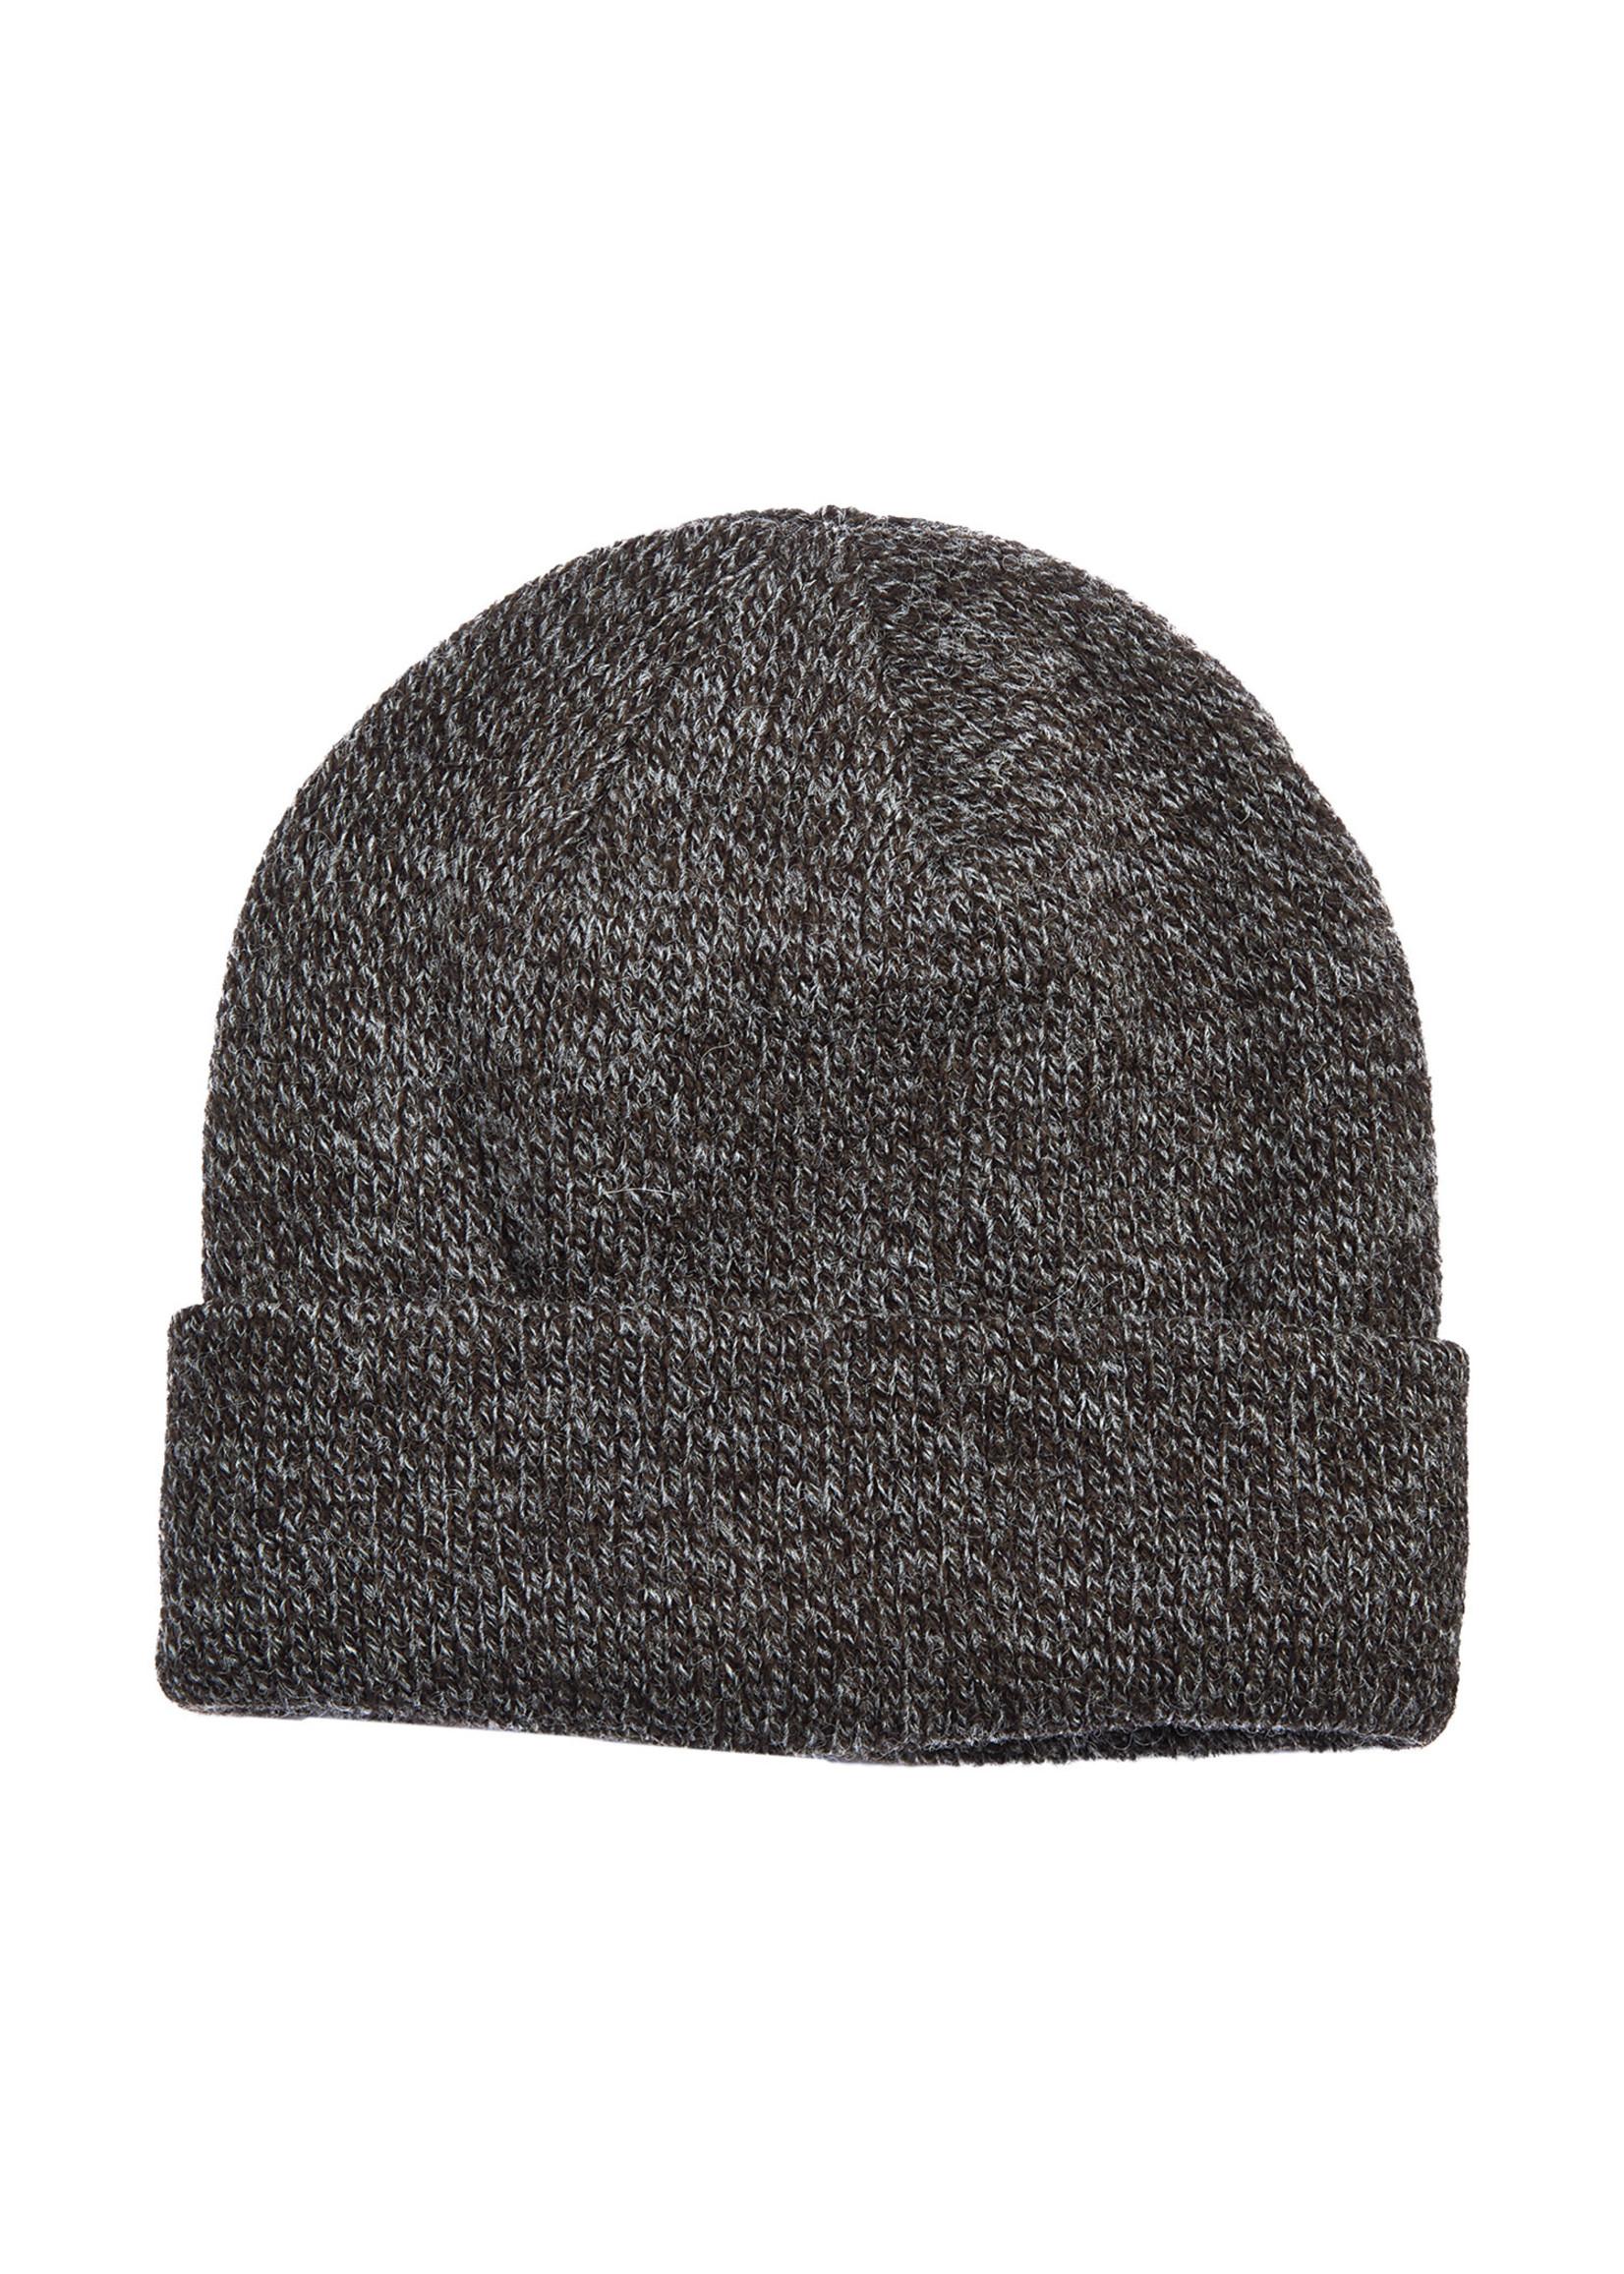 Stetson Ragg Winter Fleece Lined  Wool Cuff Cap